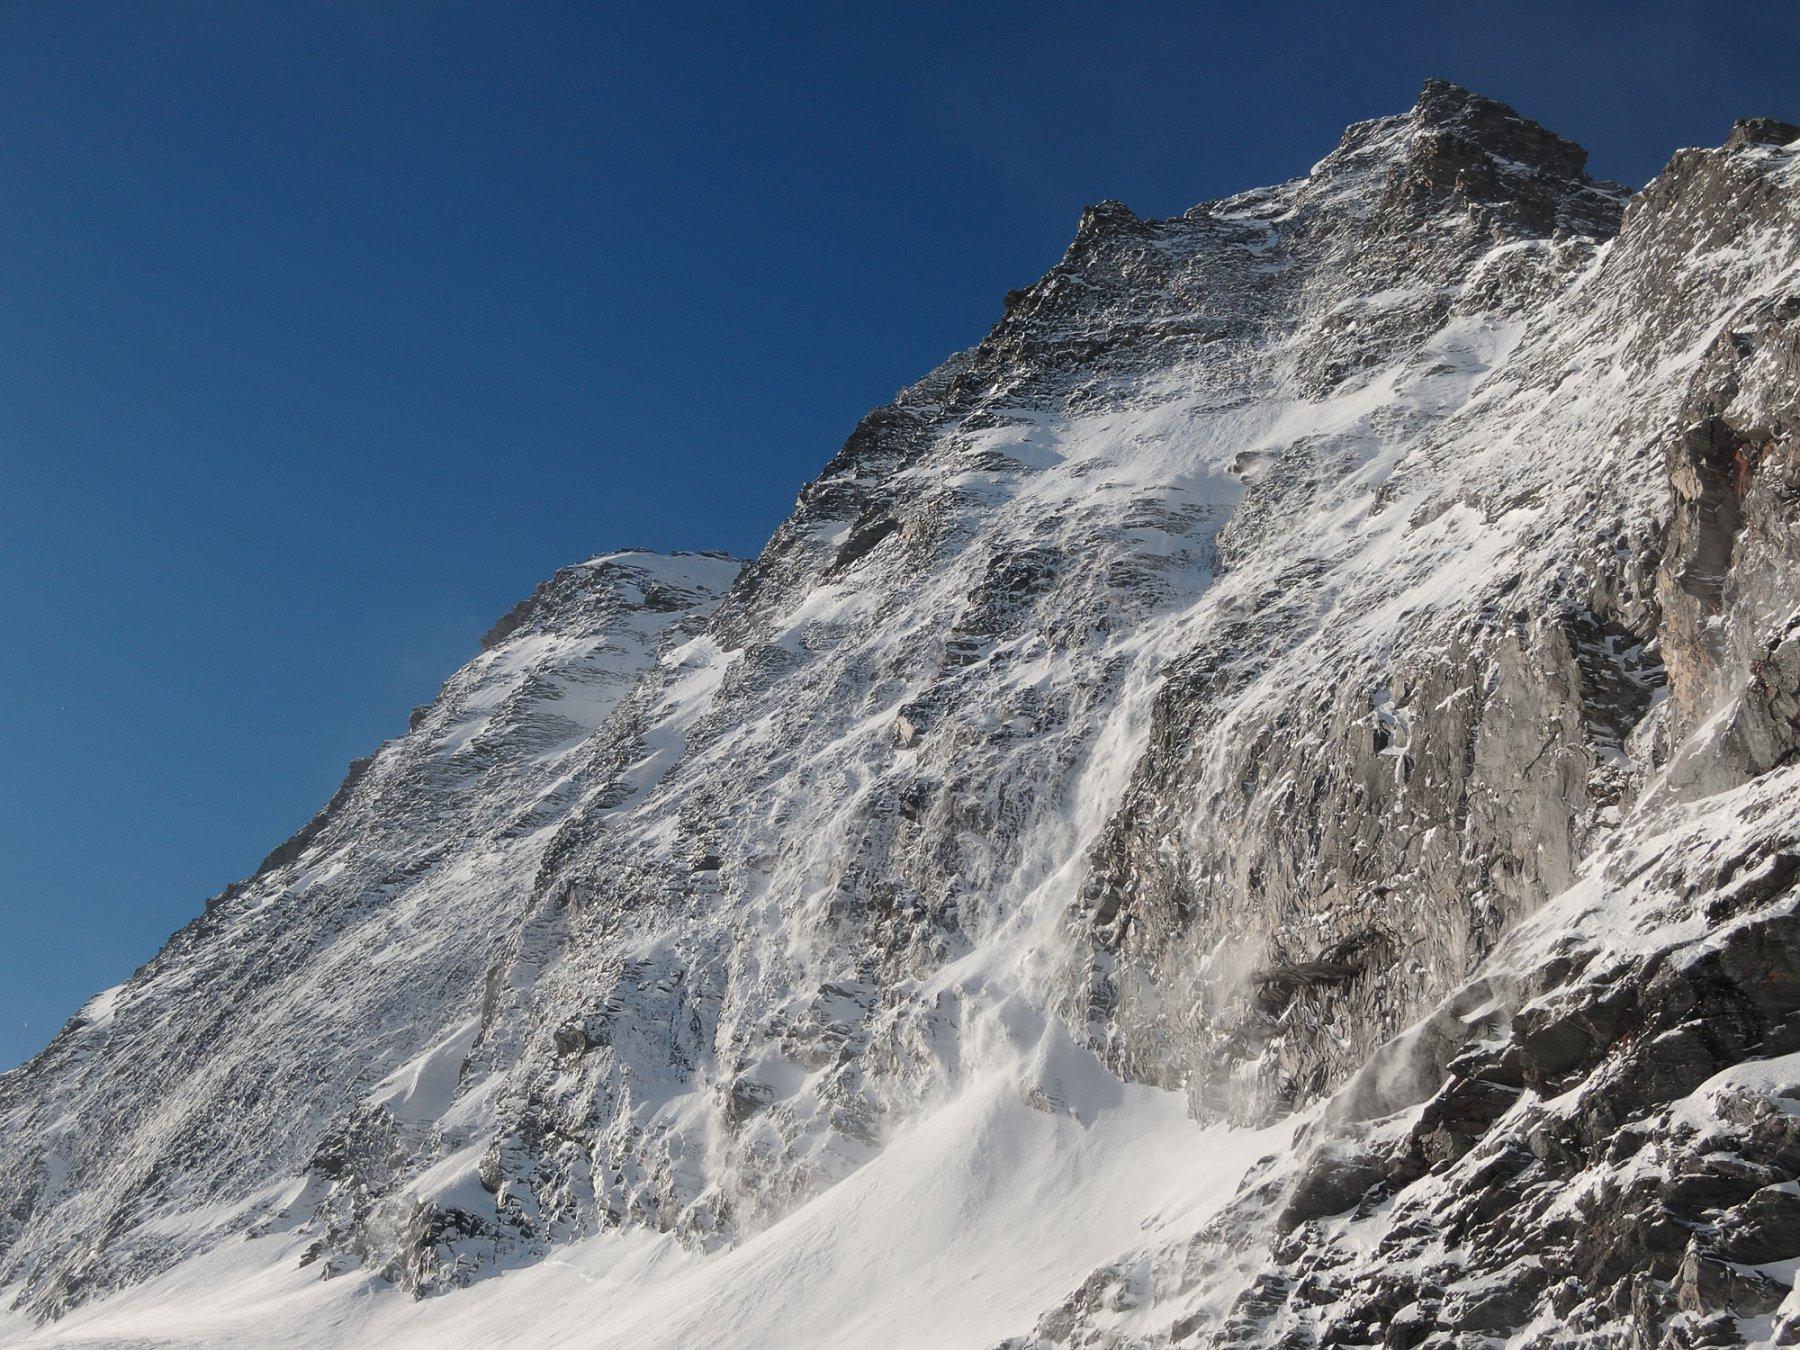 Parete Nord-Est dell'Hübschhorn che scarica neve polverosa